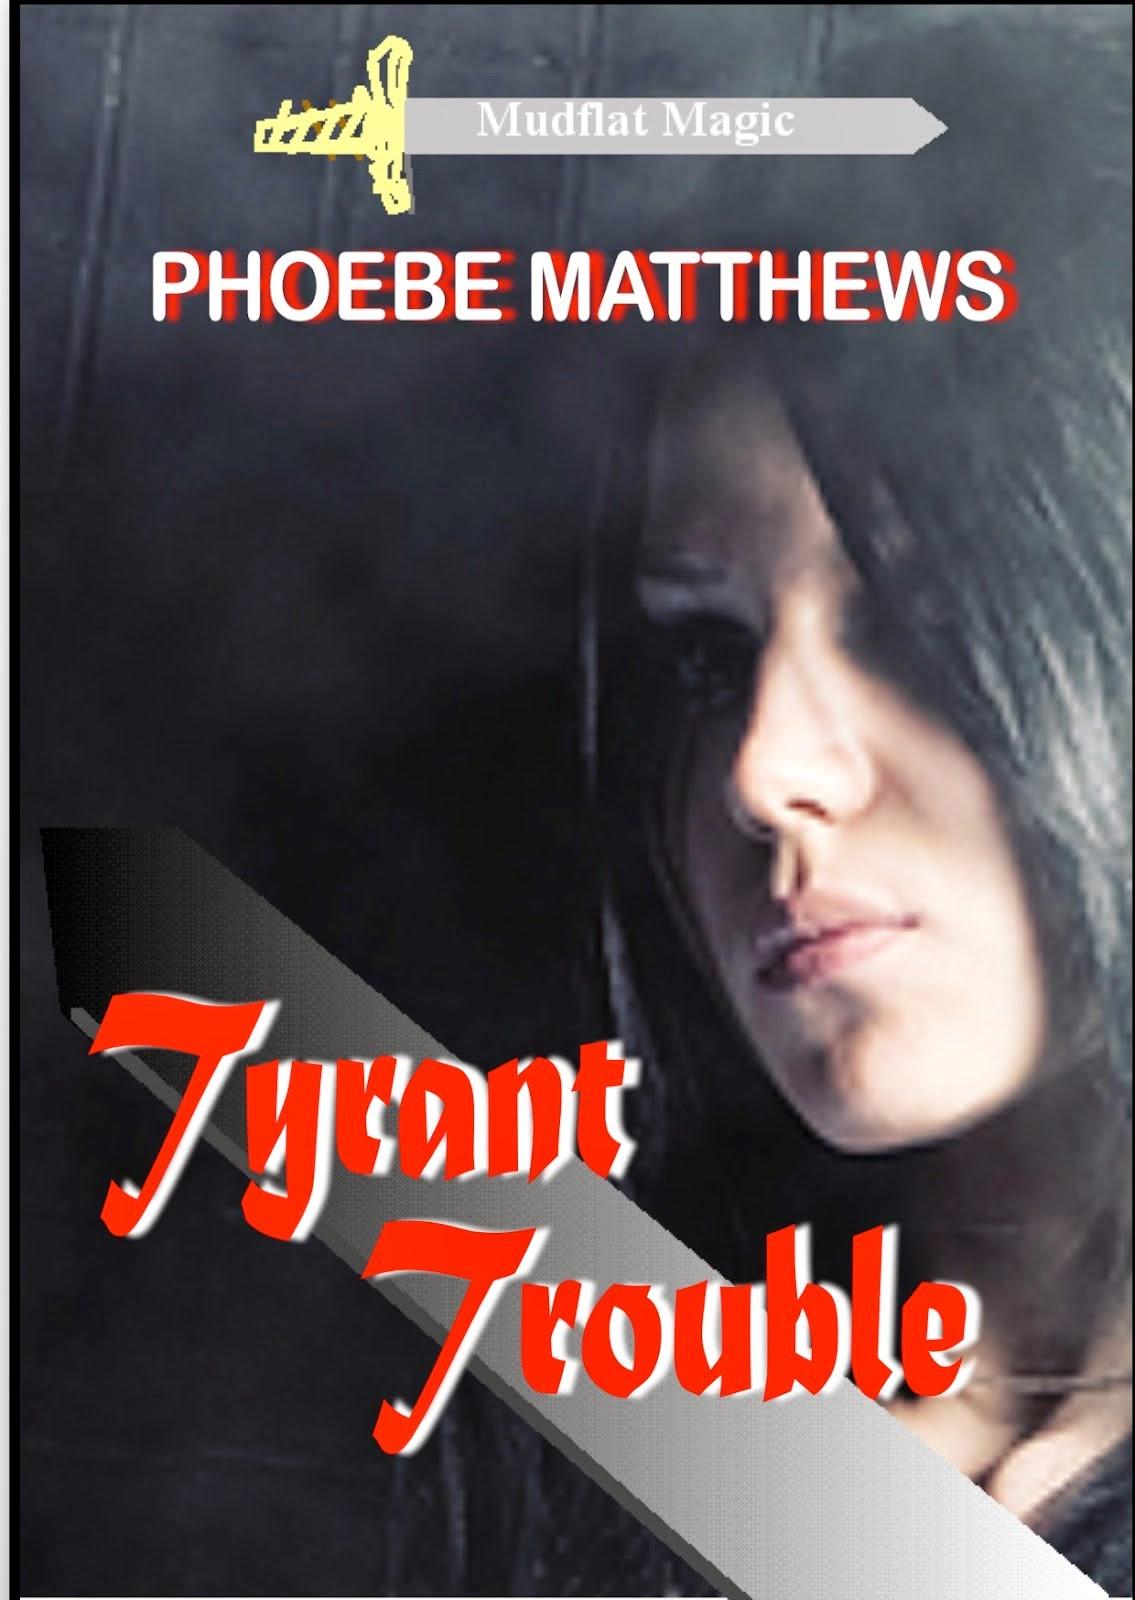 Phoebe Matthews